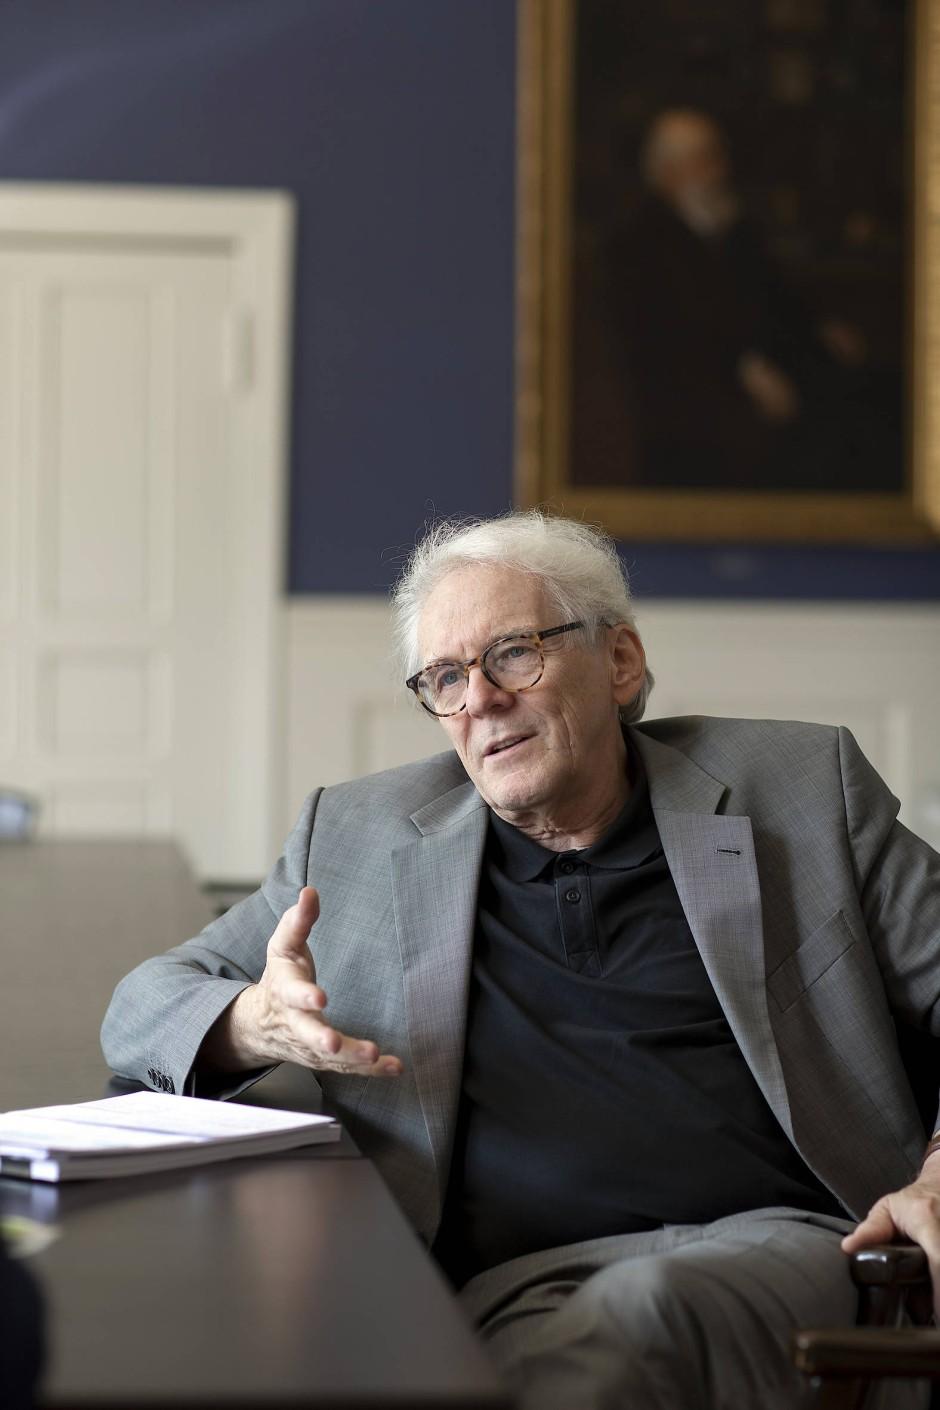 Karl Max Einhäupl